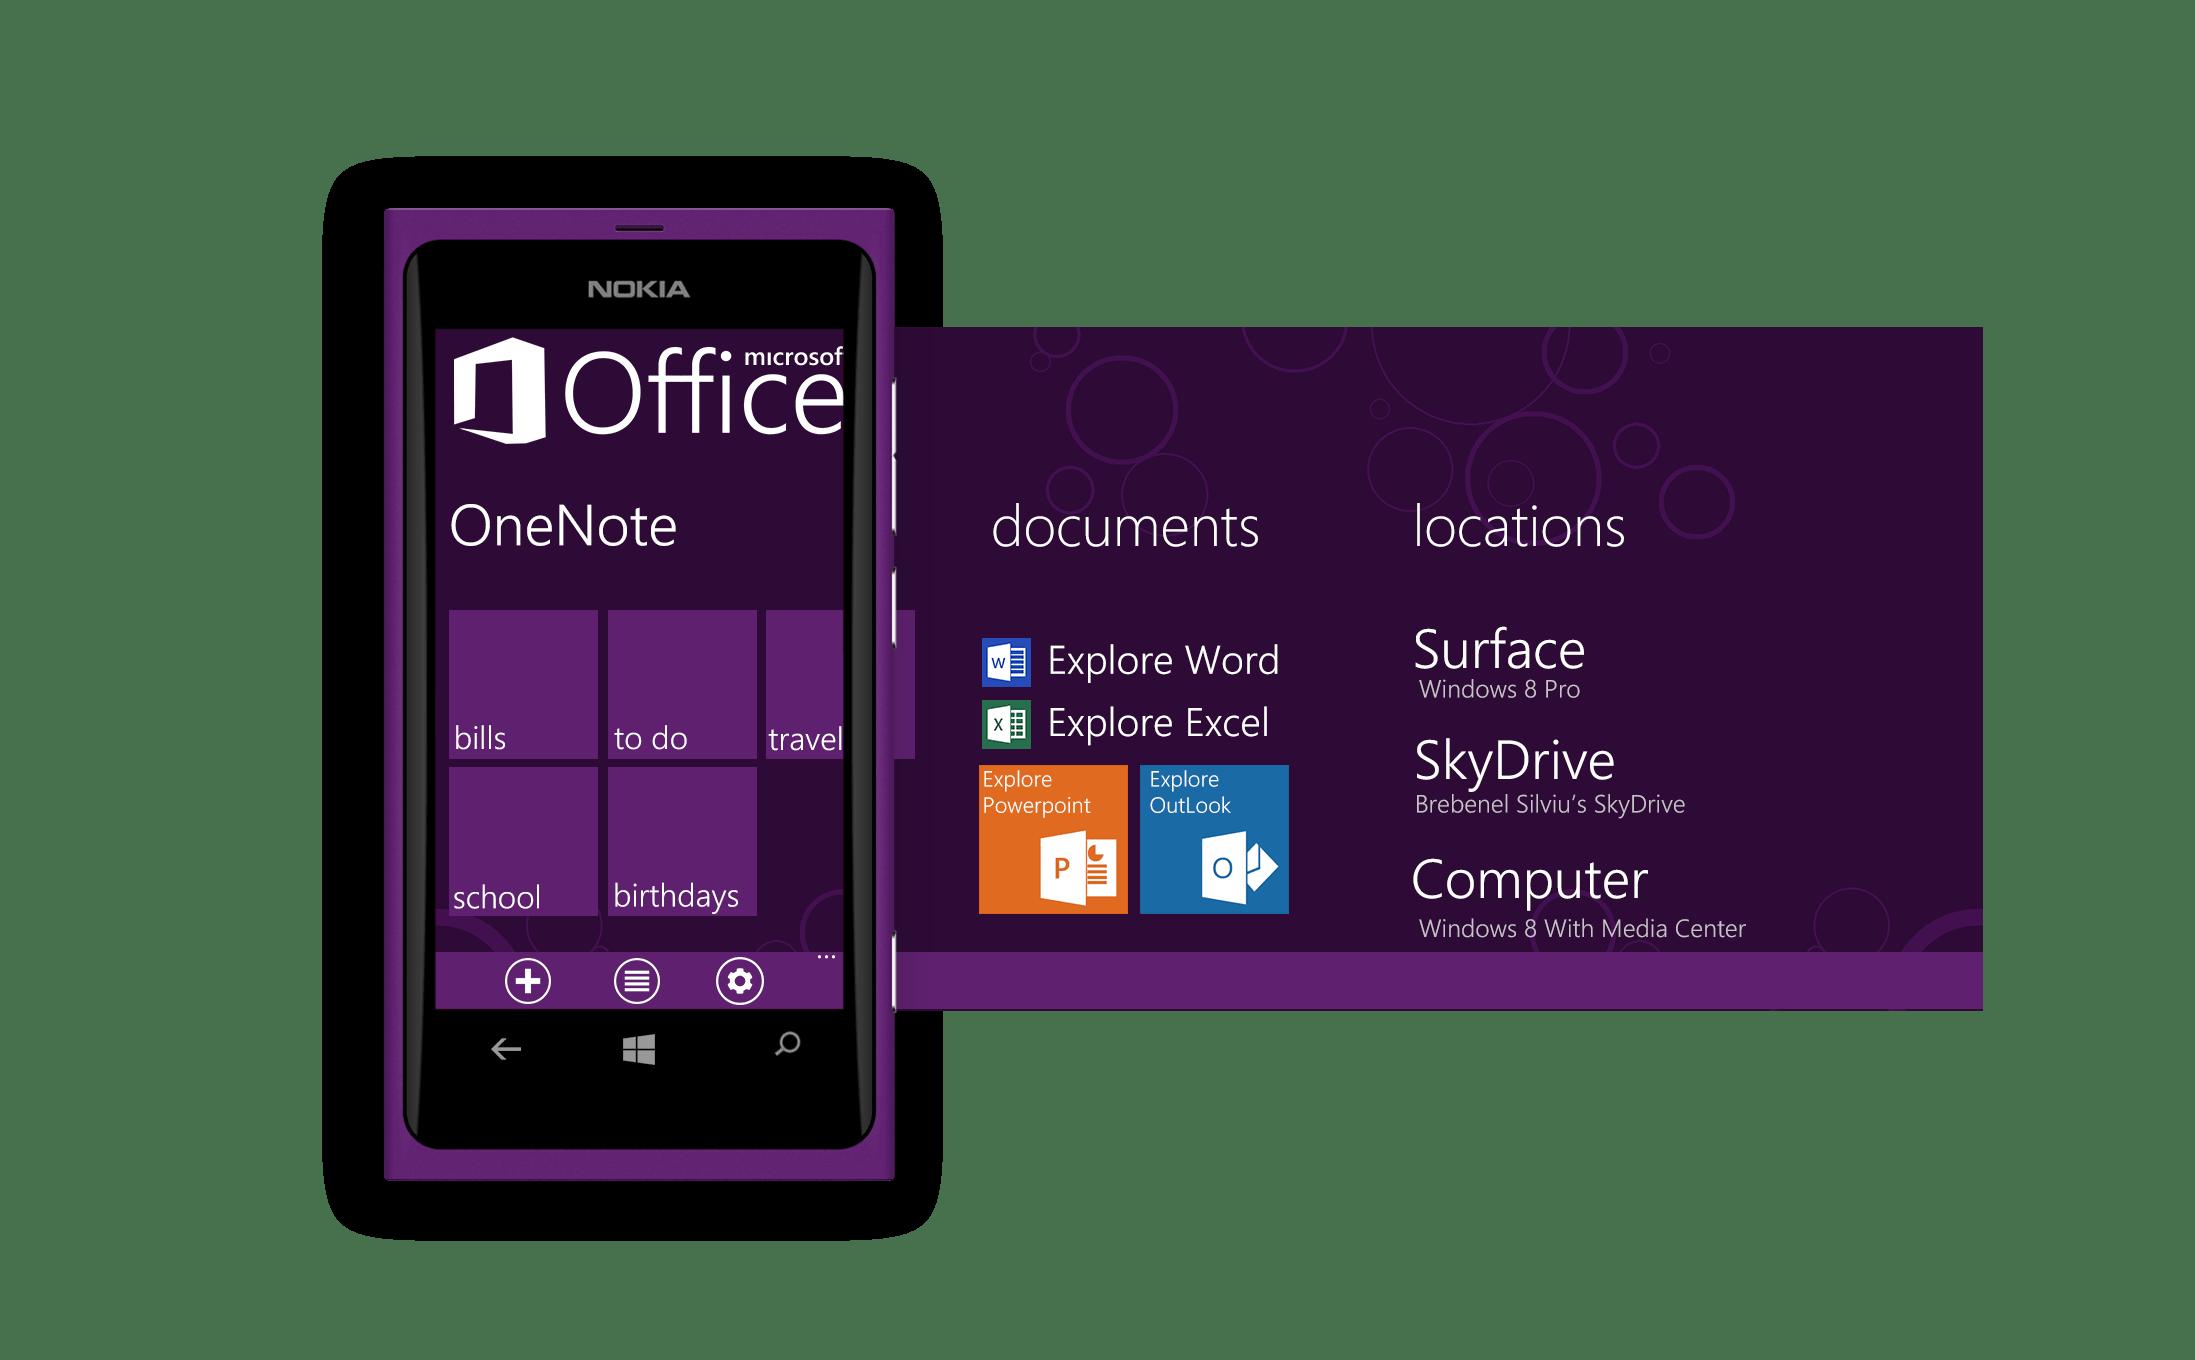 MS Office on Windows Phone